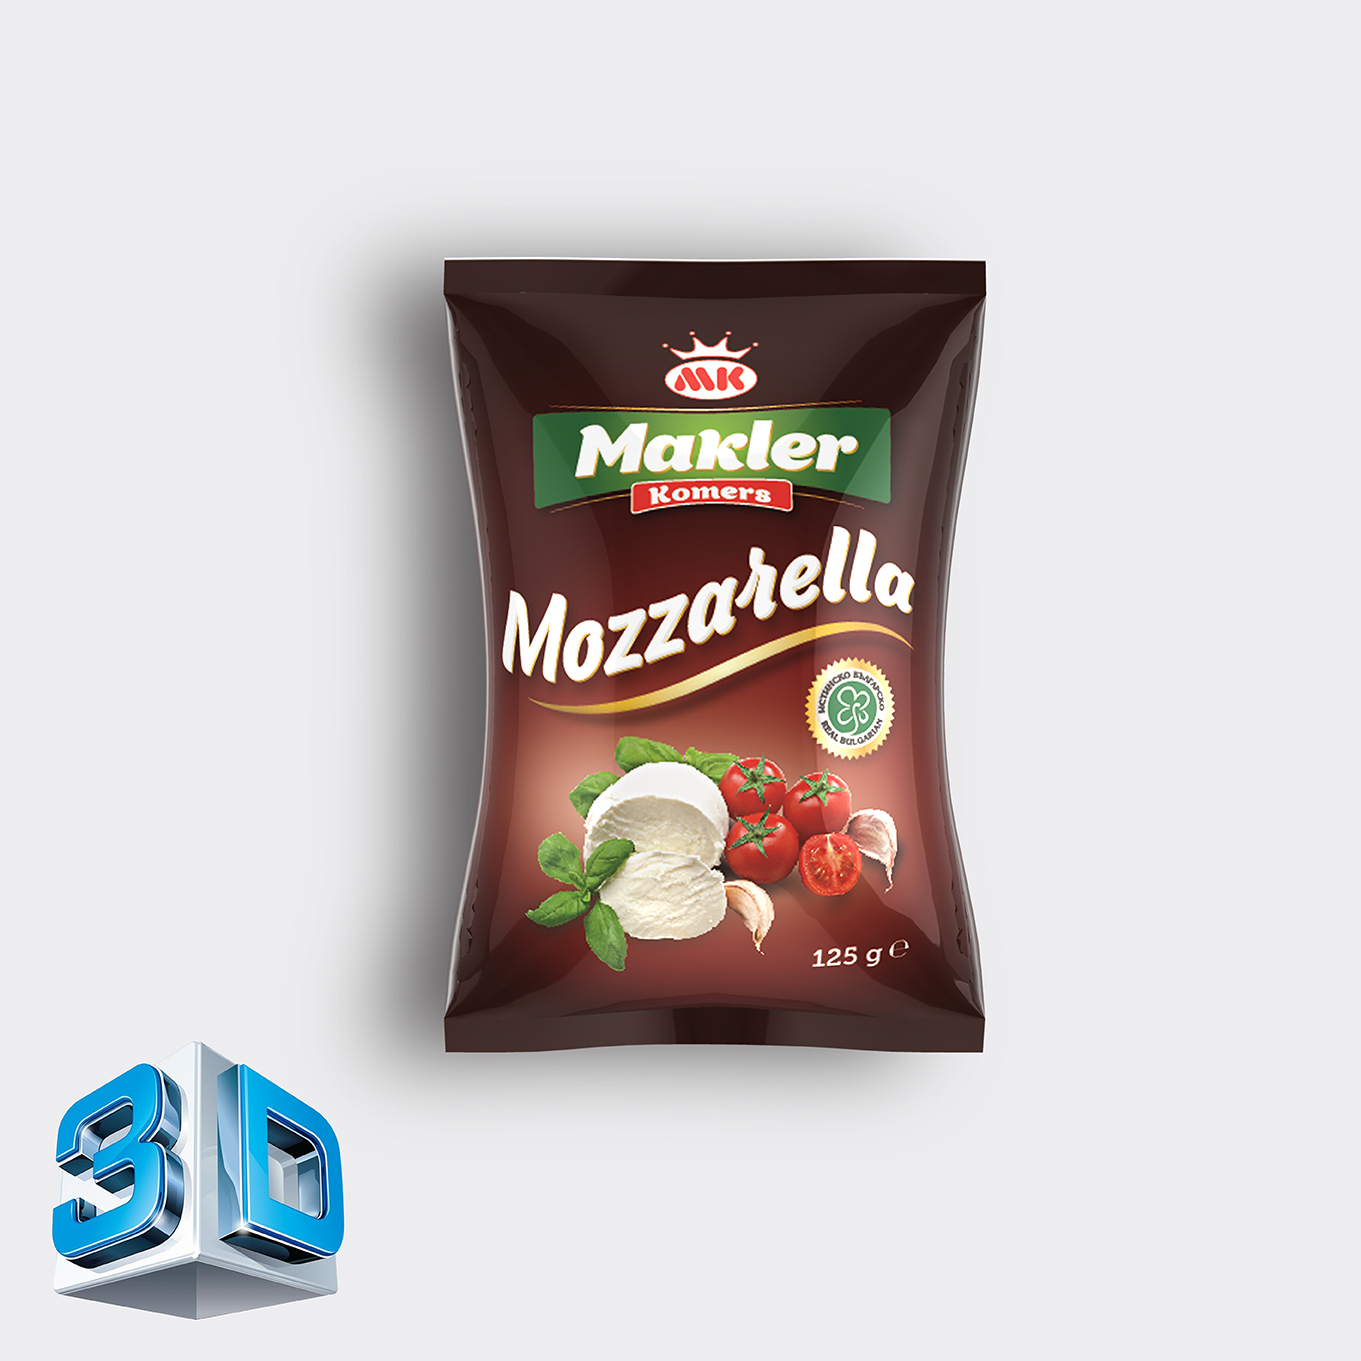 makler-mozzarella-ambalaj-tasarimi